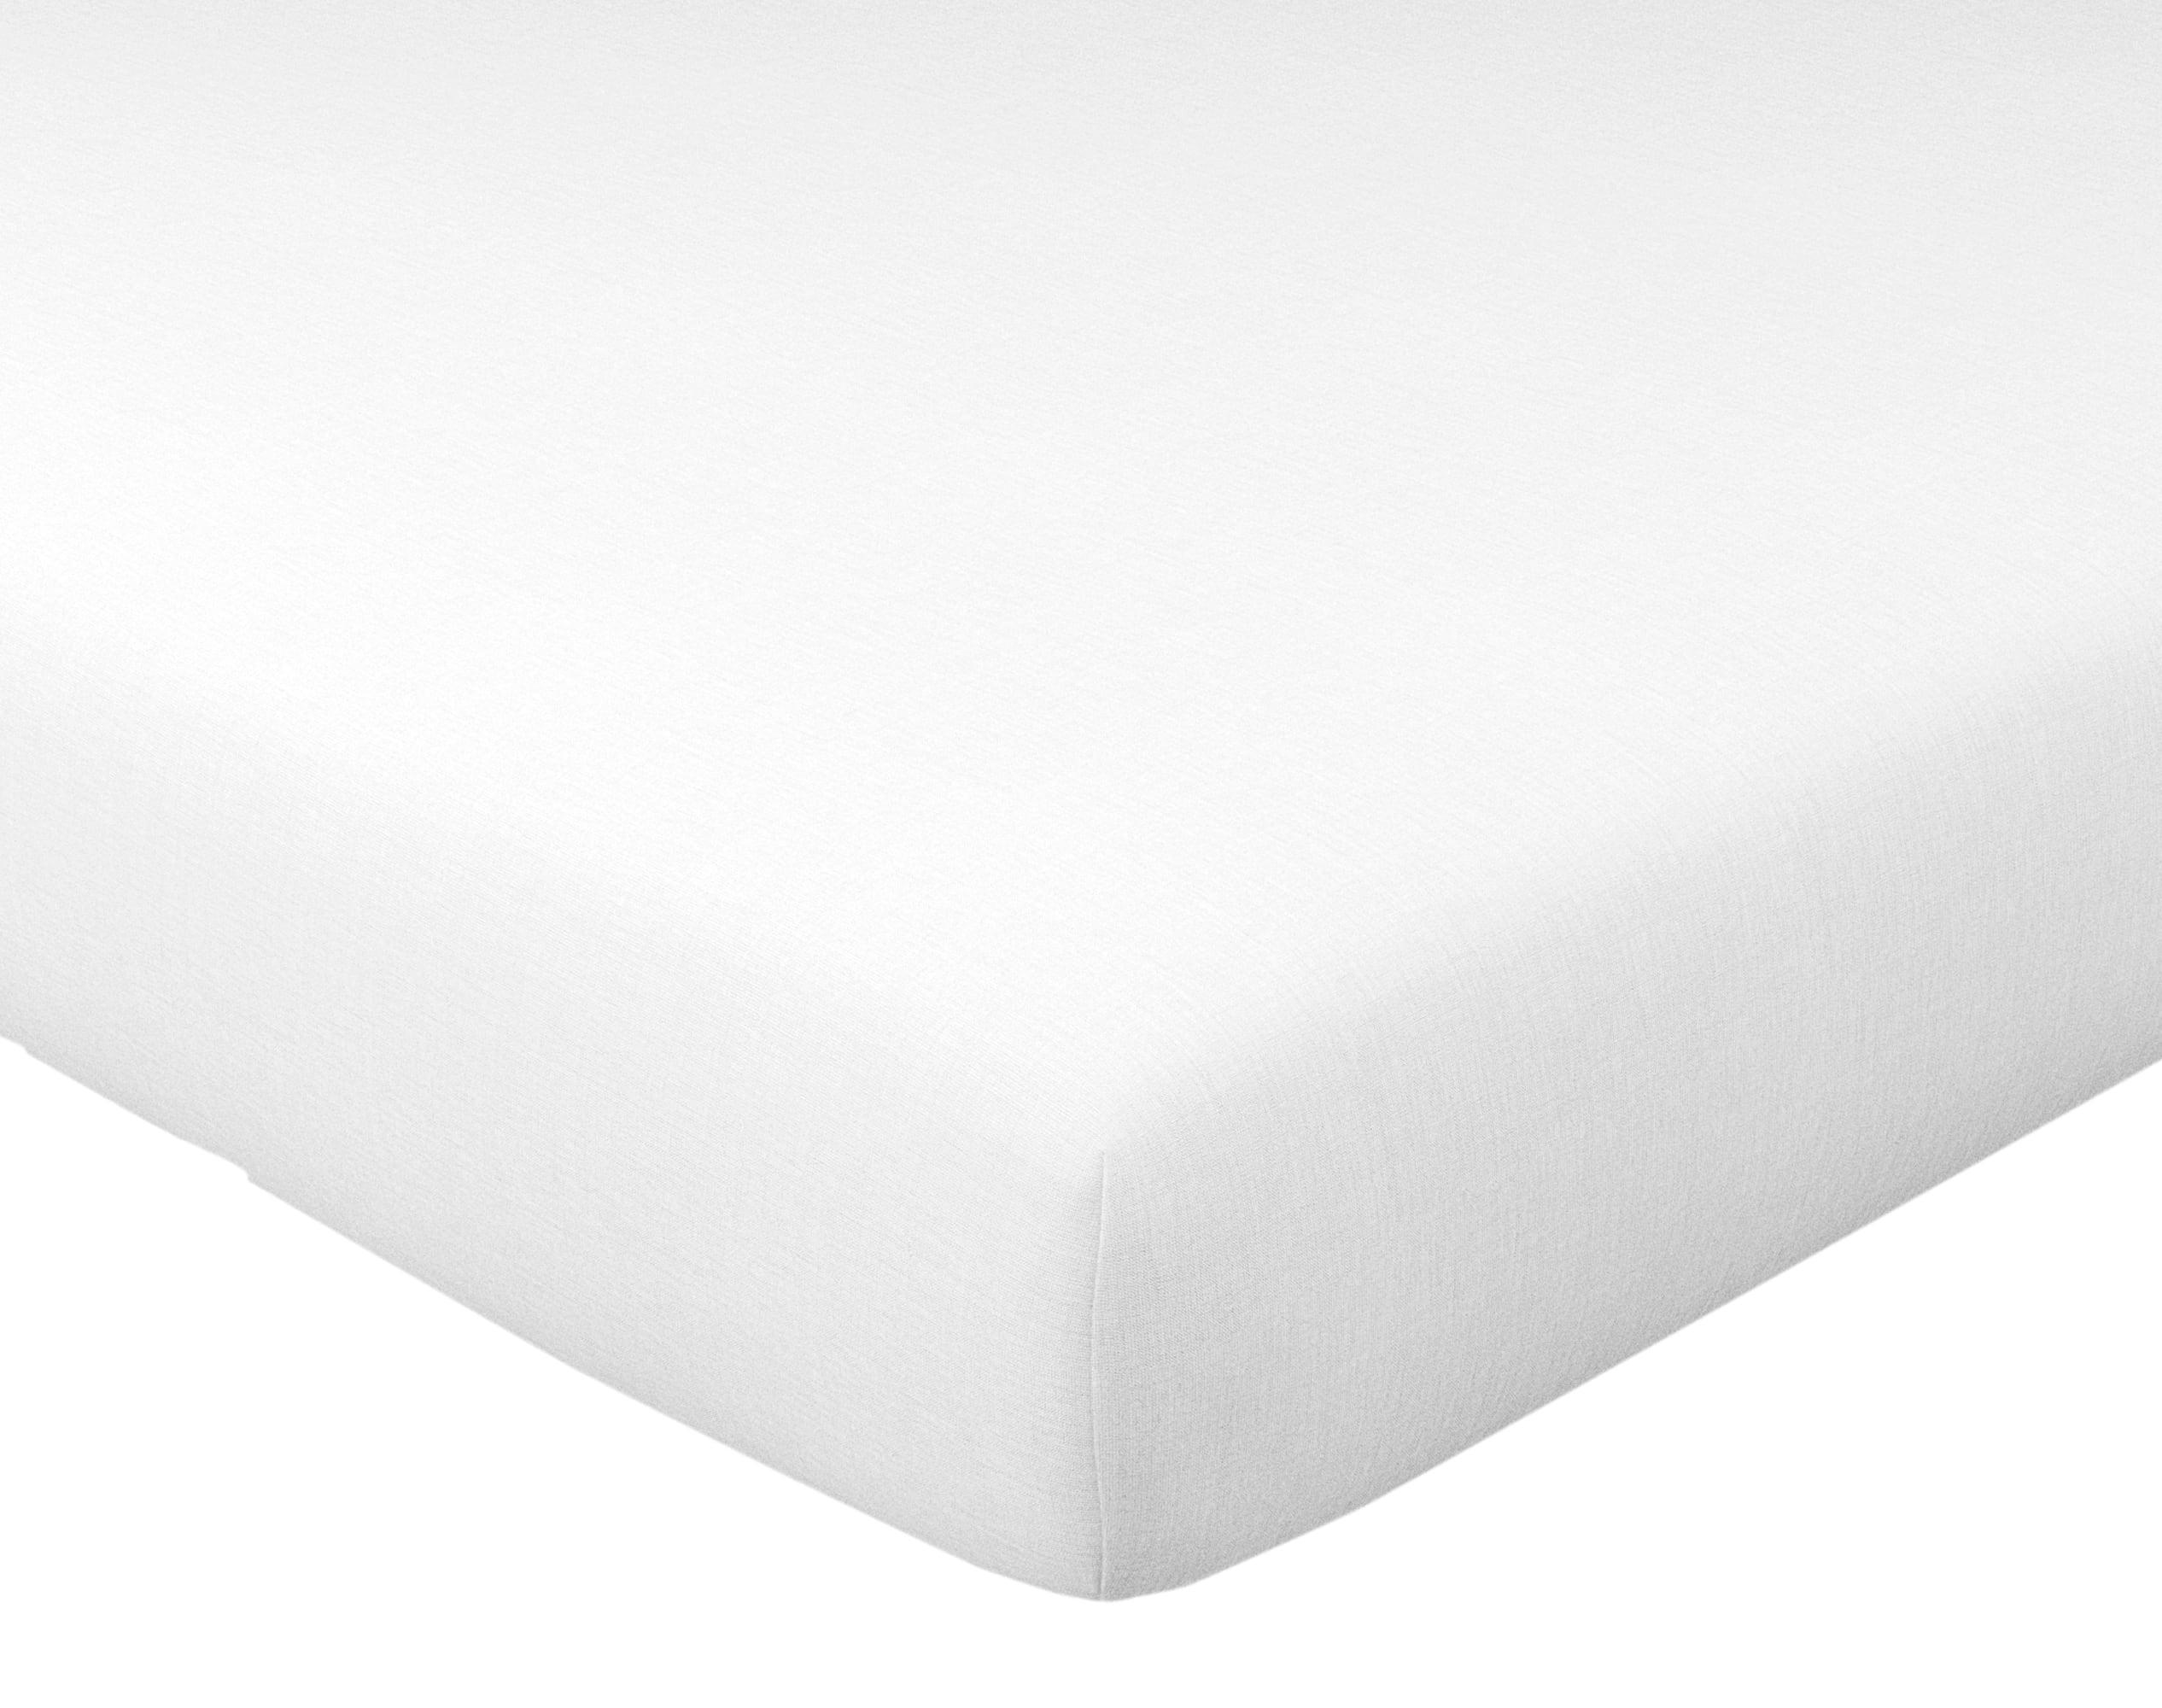 Drap-housse 140x190 en lin lavé blanc